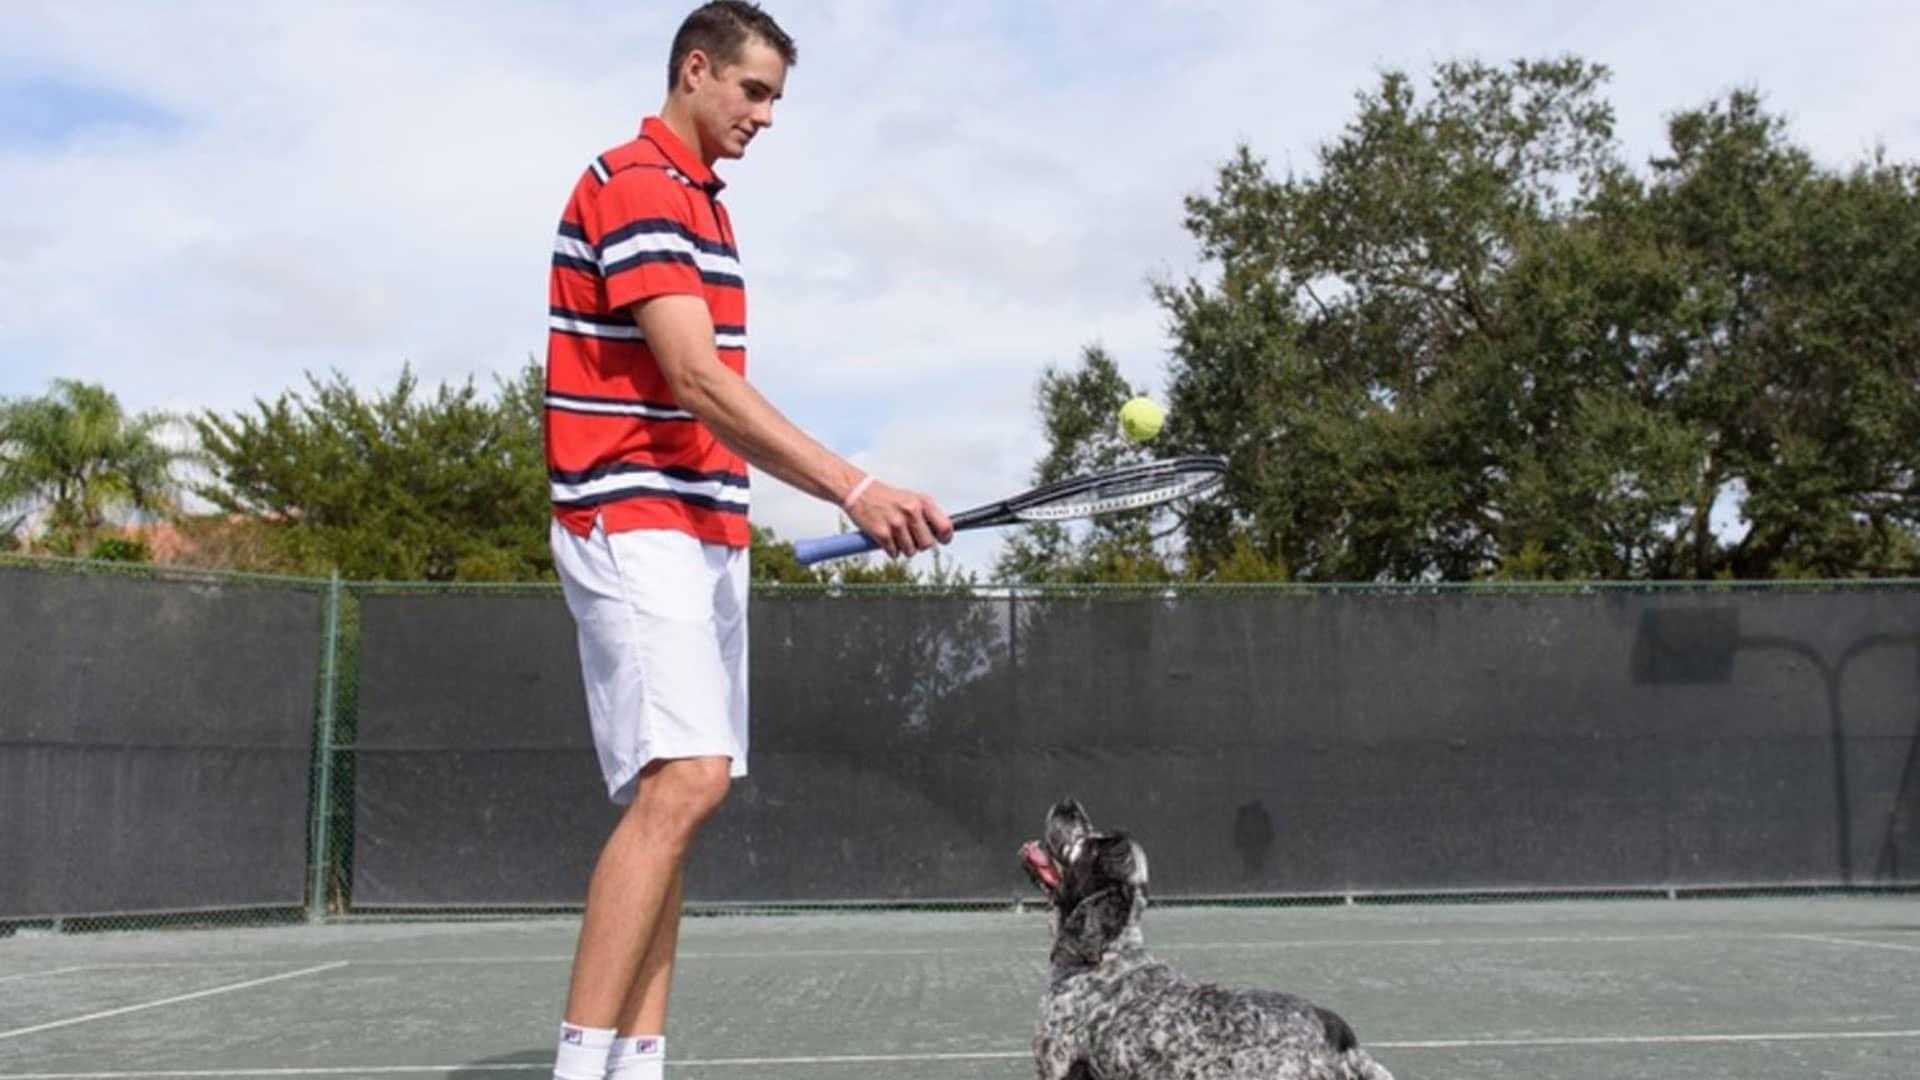 Isner and dog